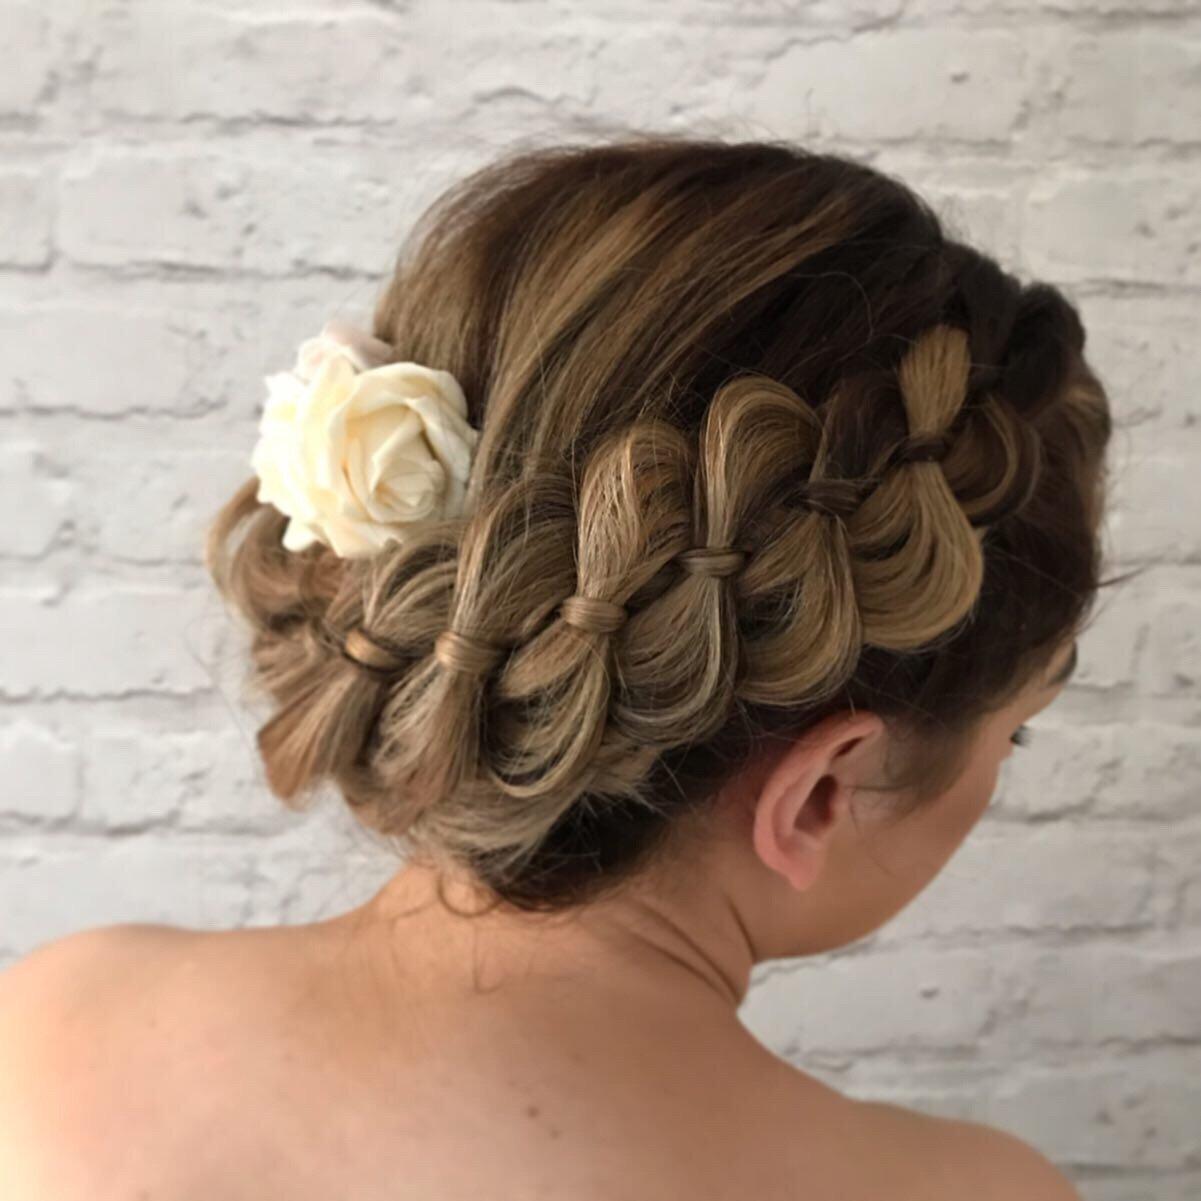 braidsupdoweddinghairstyles plaits